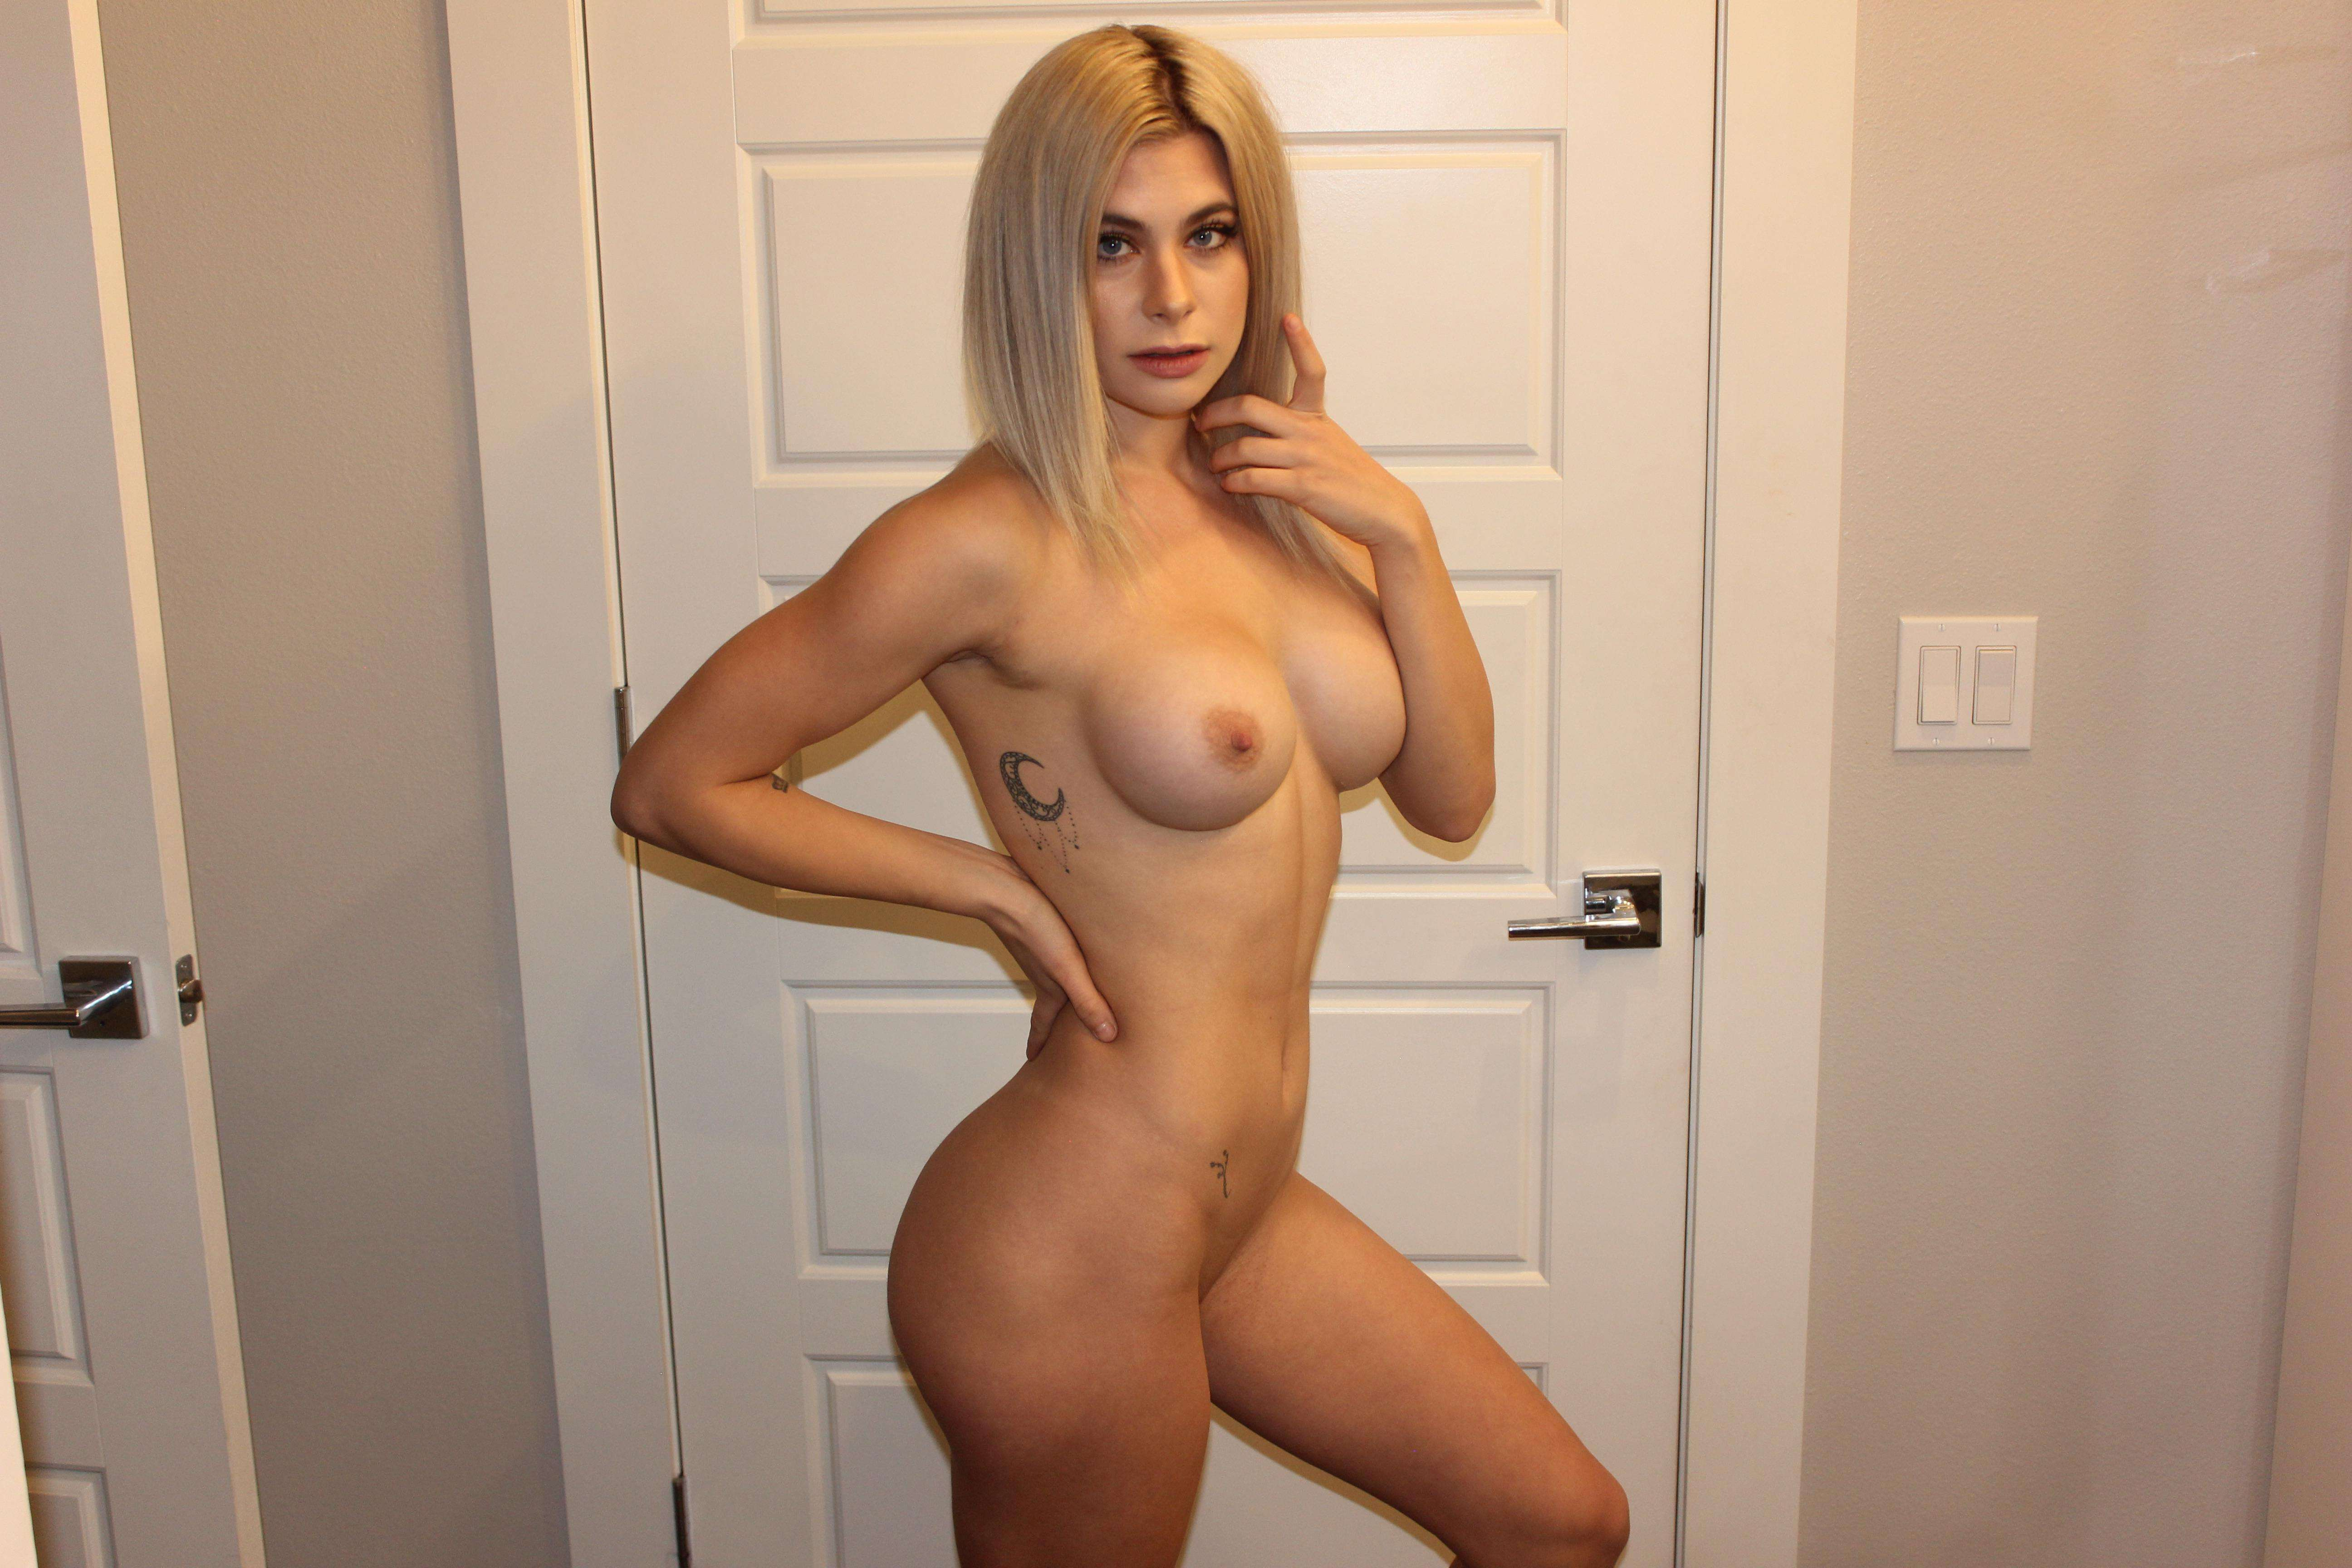 https://fitnakedgirls.com/wp-content/uploads/2020/10/FitNakedGirls.com-Livi-Mawie-nude-27.jpg